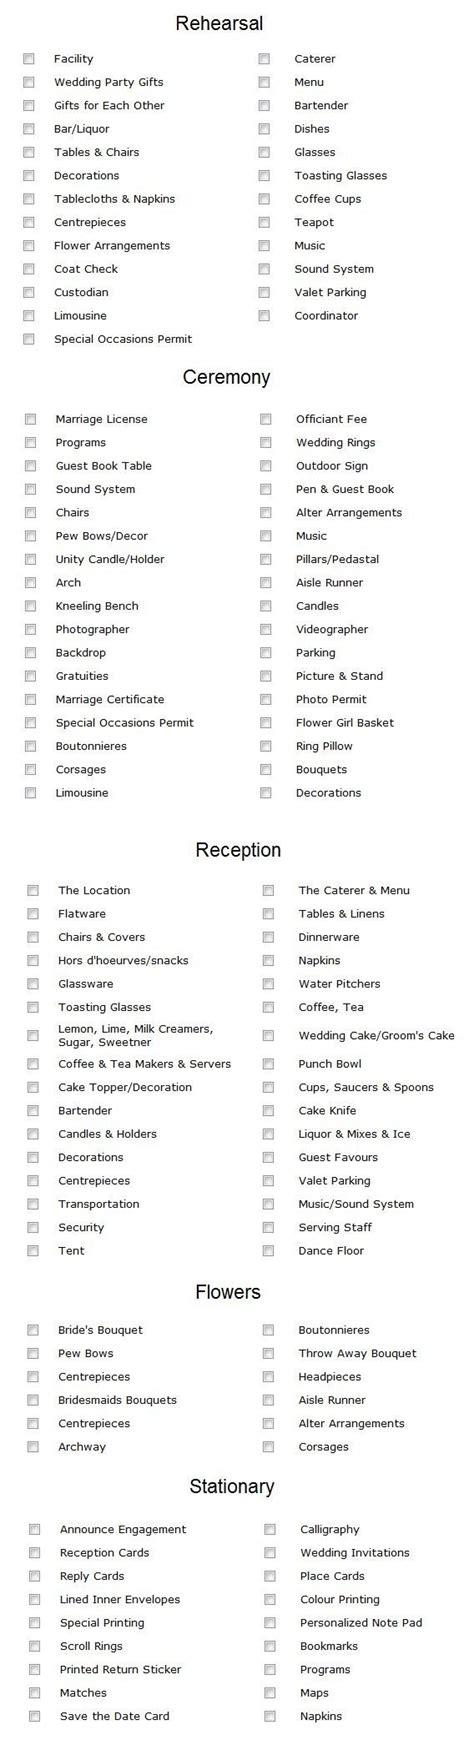 printable wedding checklist nz top 5 wedding planning checklists to keep you on track